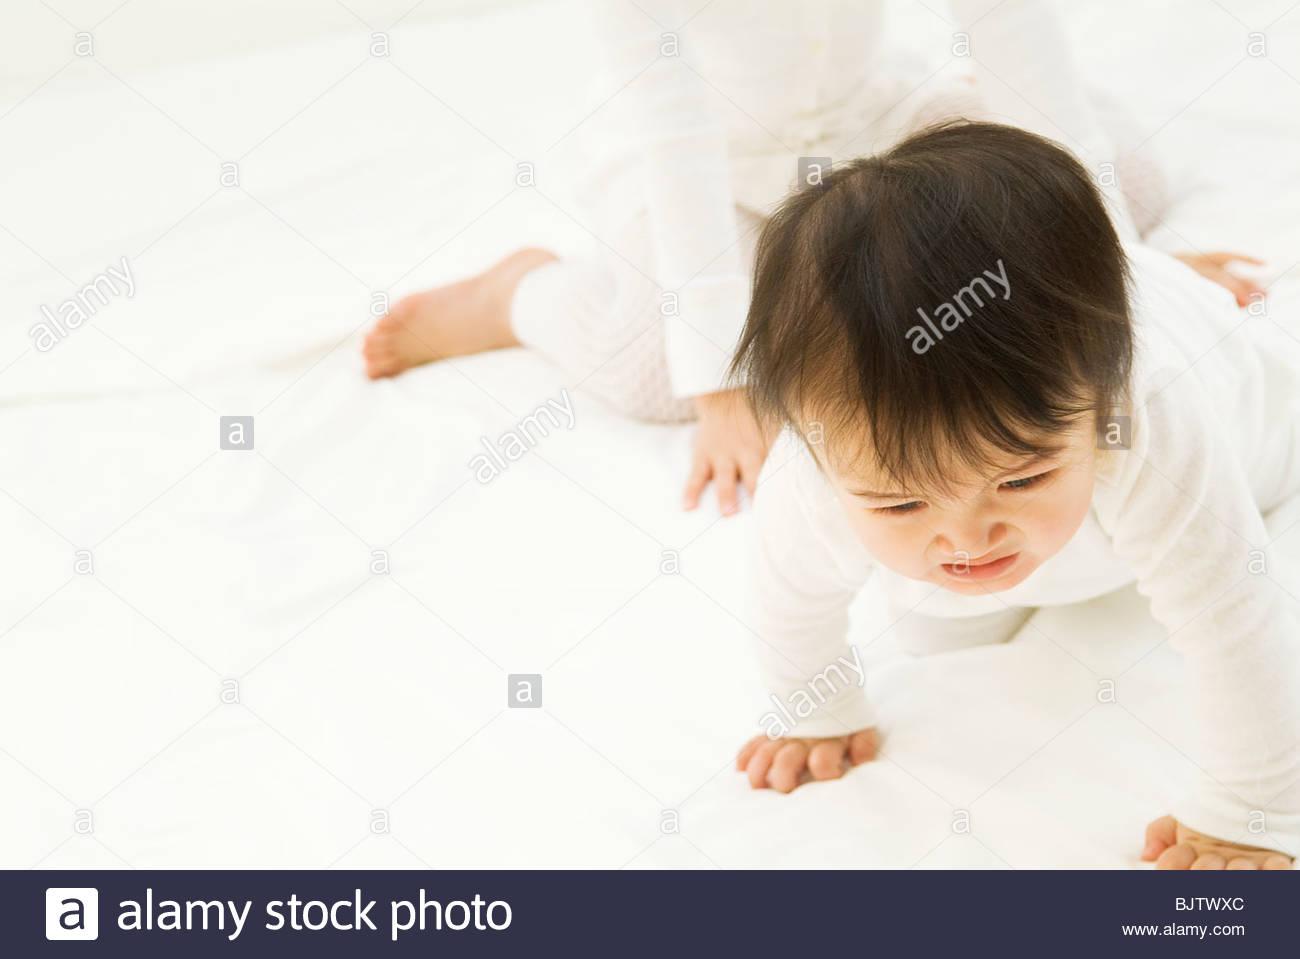 Rastreo de bebé a punto de llorar Foto de stock